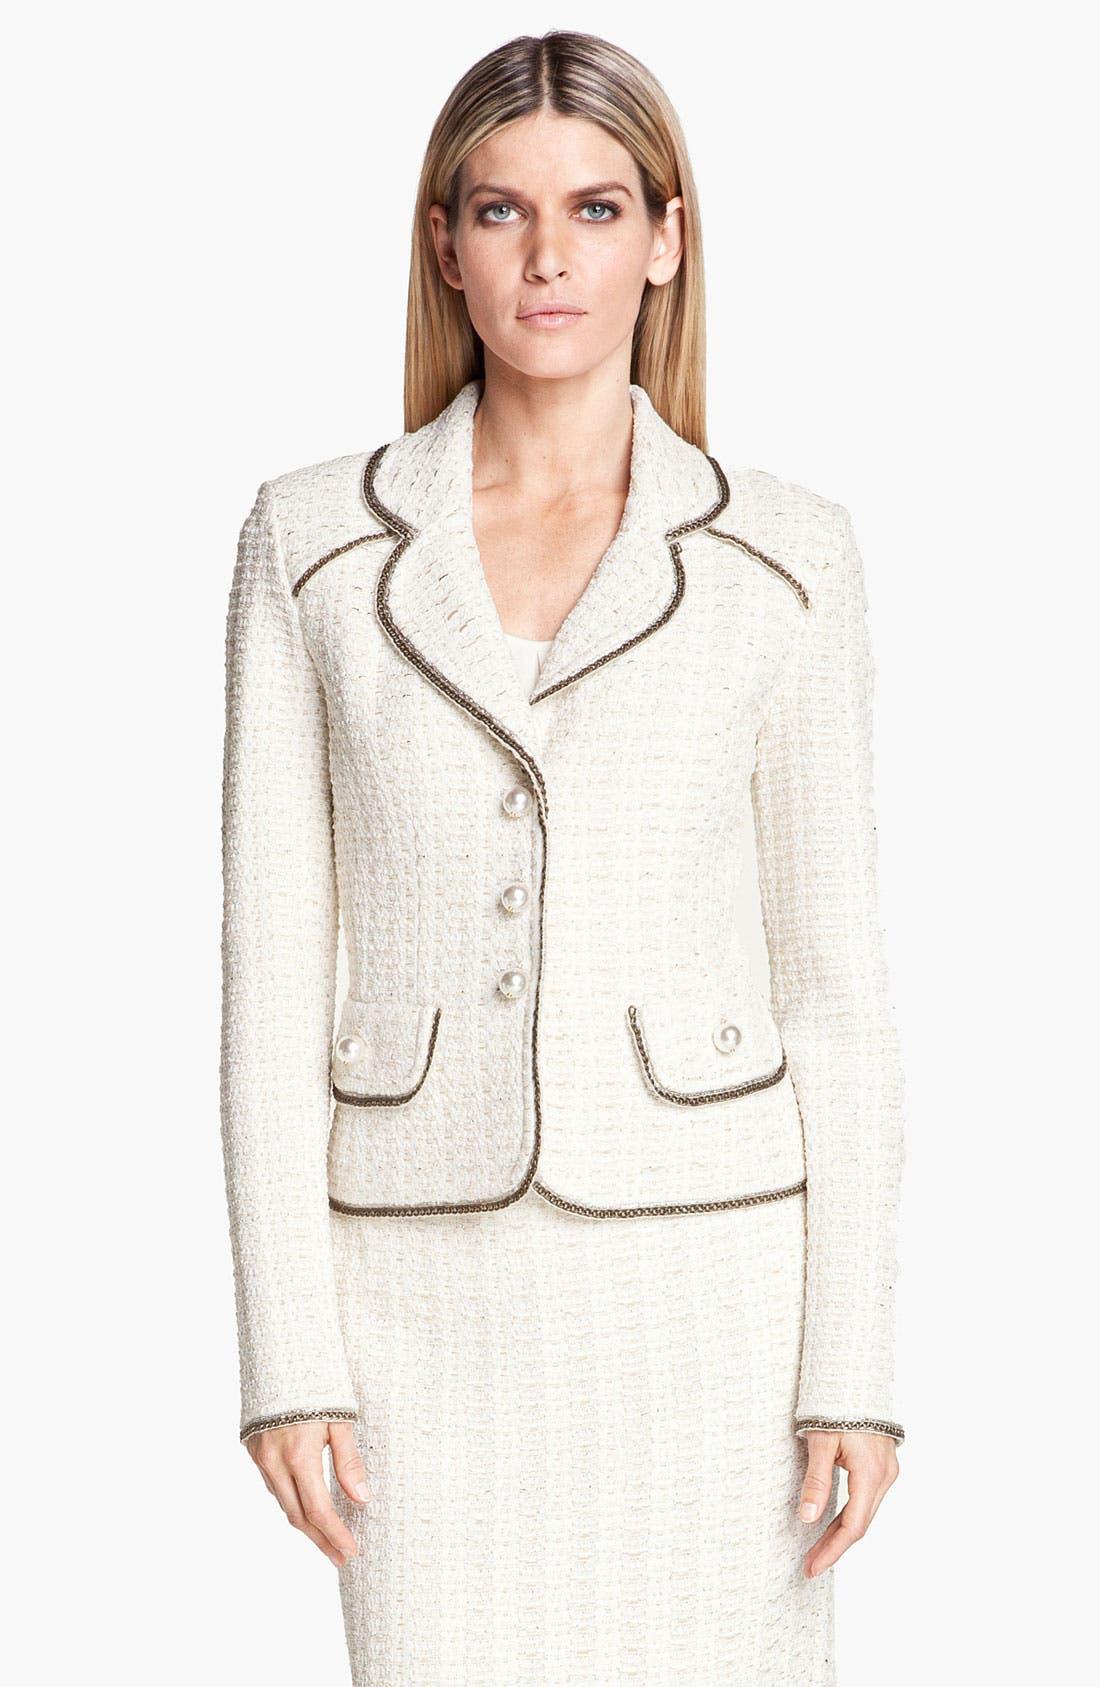 Alternate Image 1 Selected - St. John Collection Belgravia Tweed Jacket